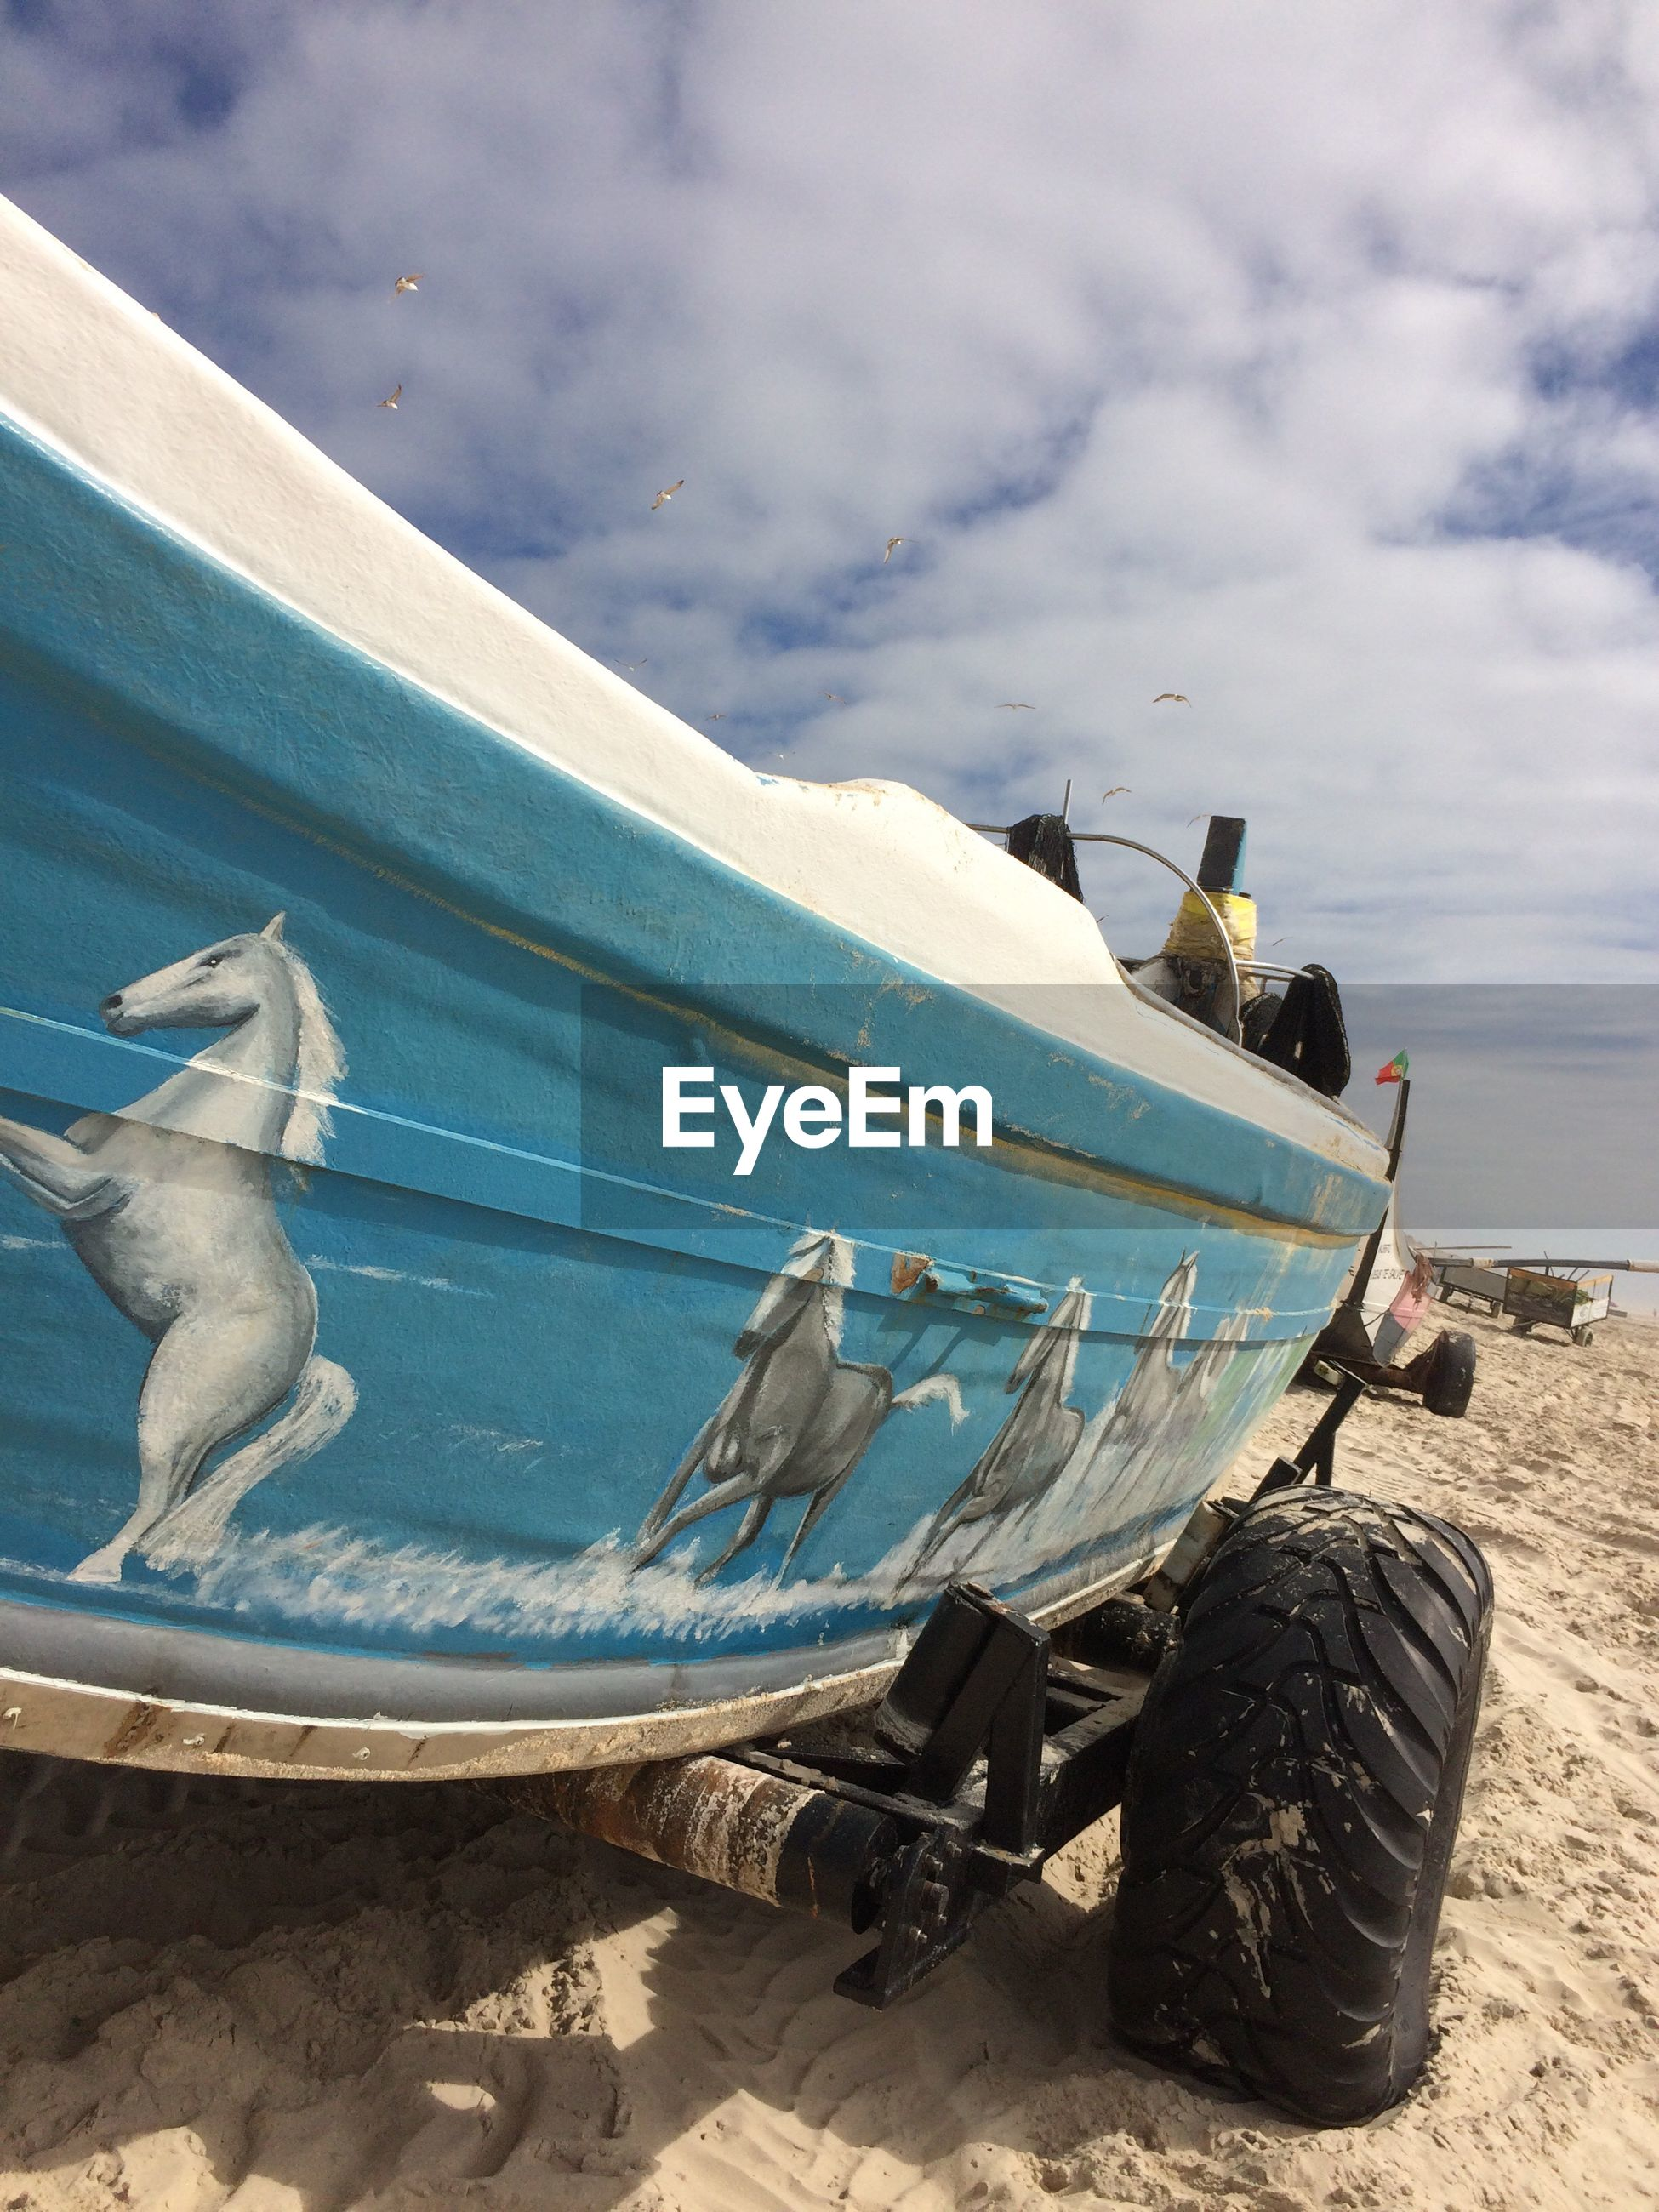 Boat on cart at sandy beach